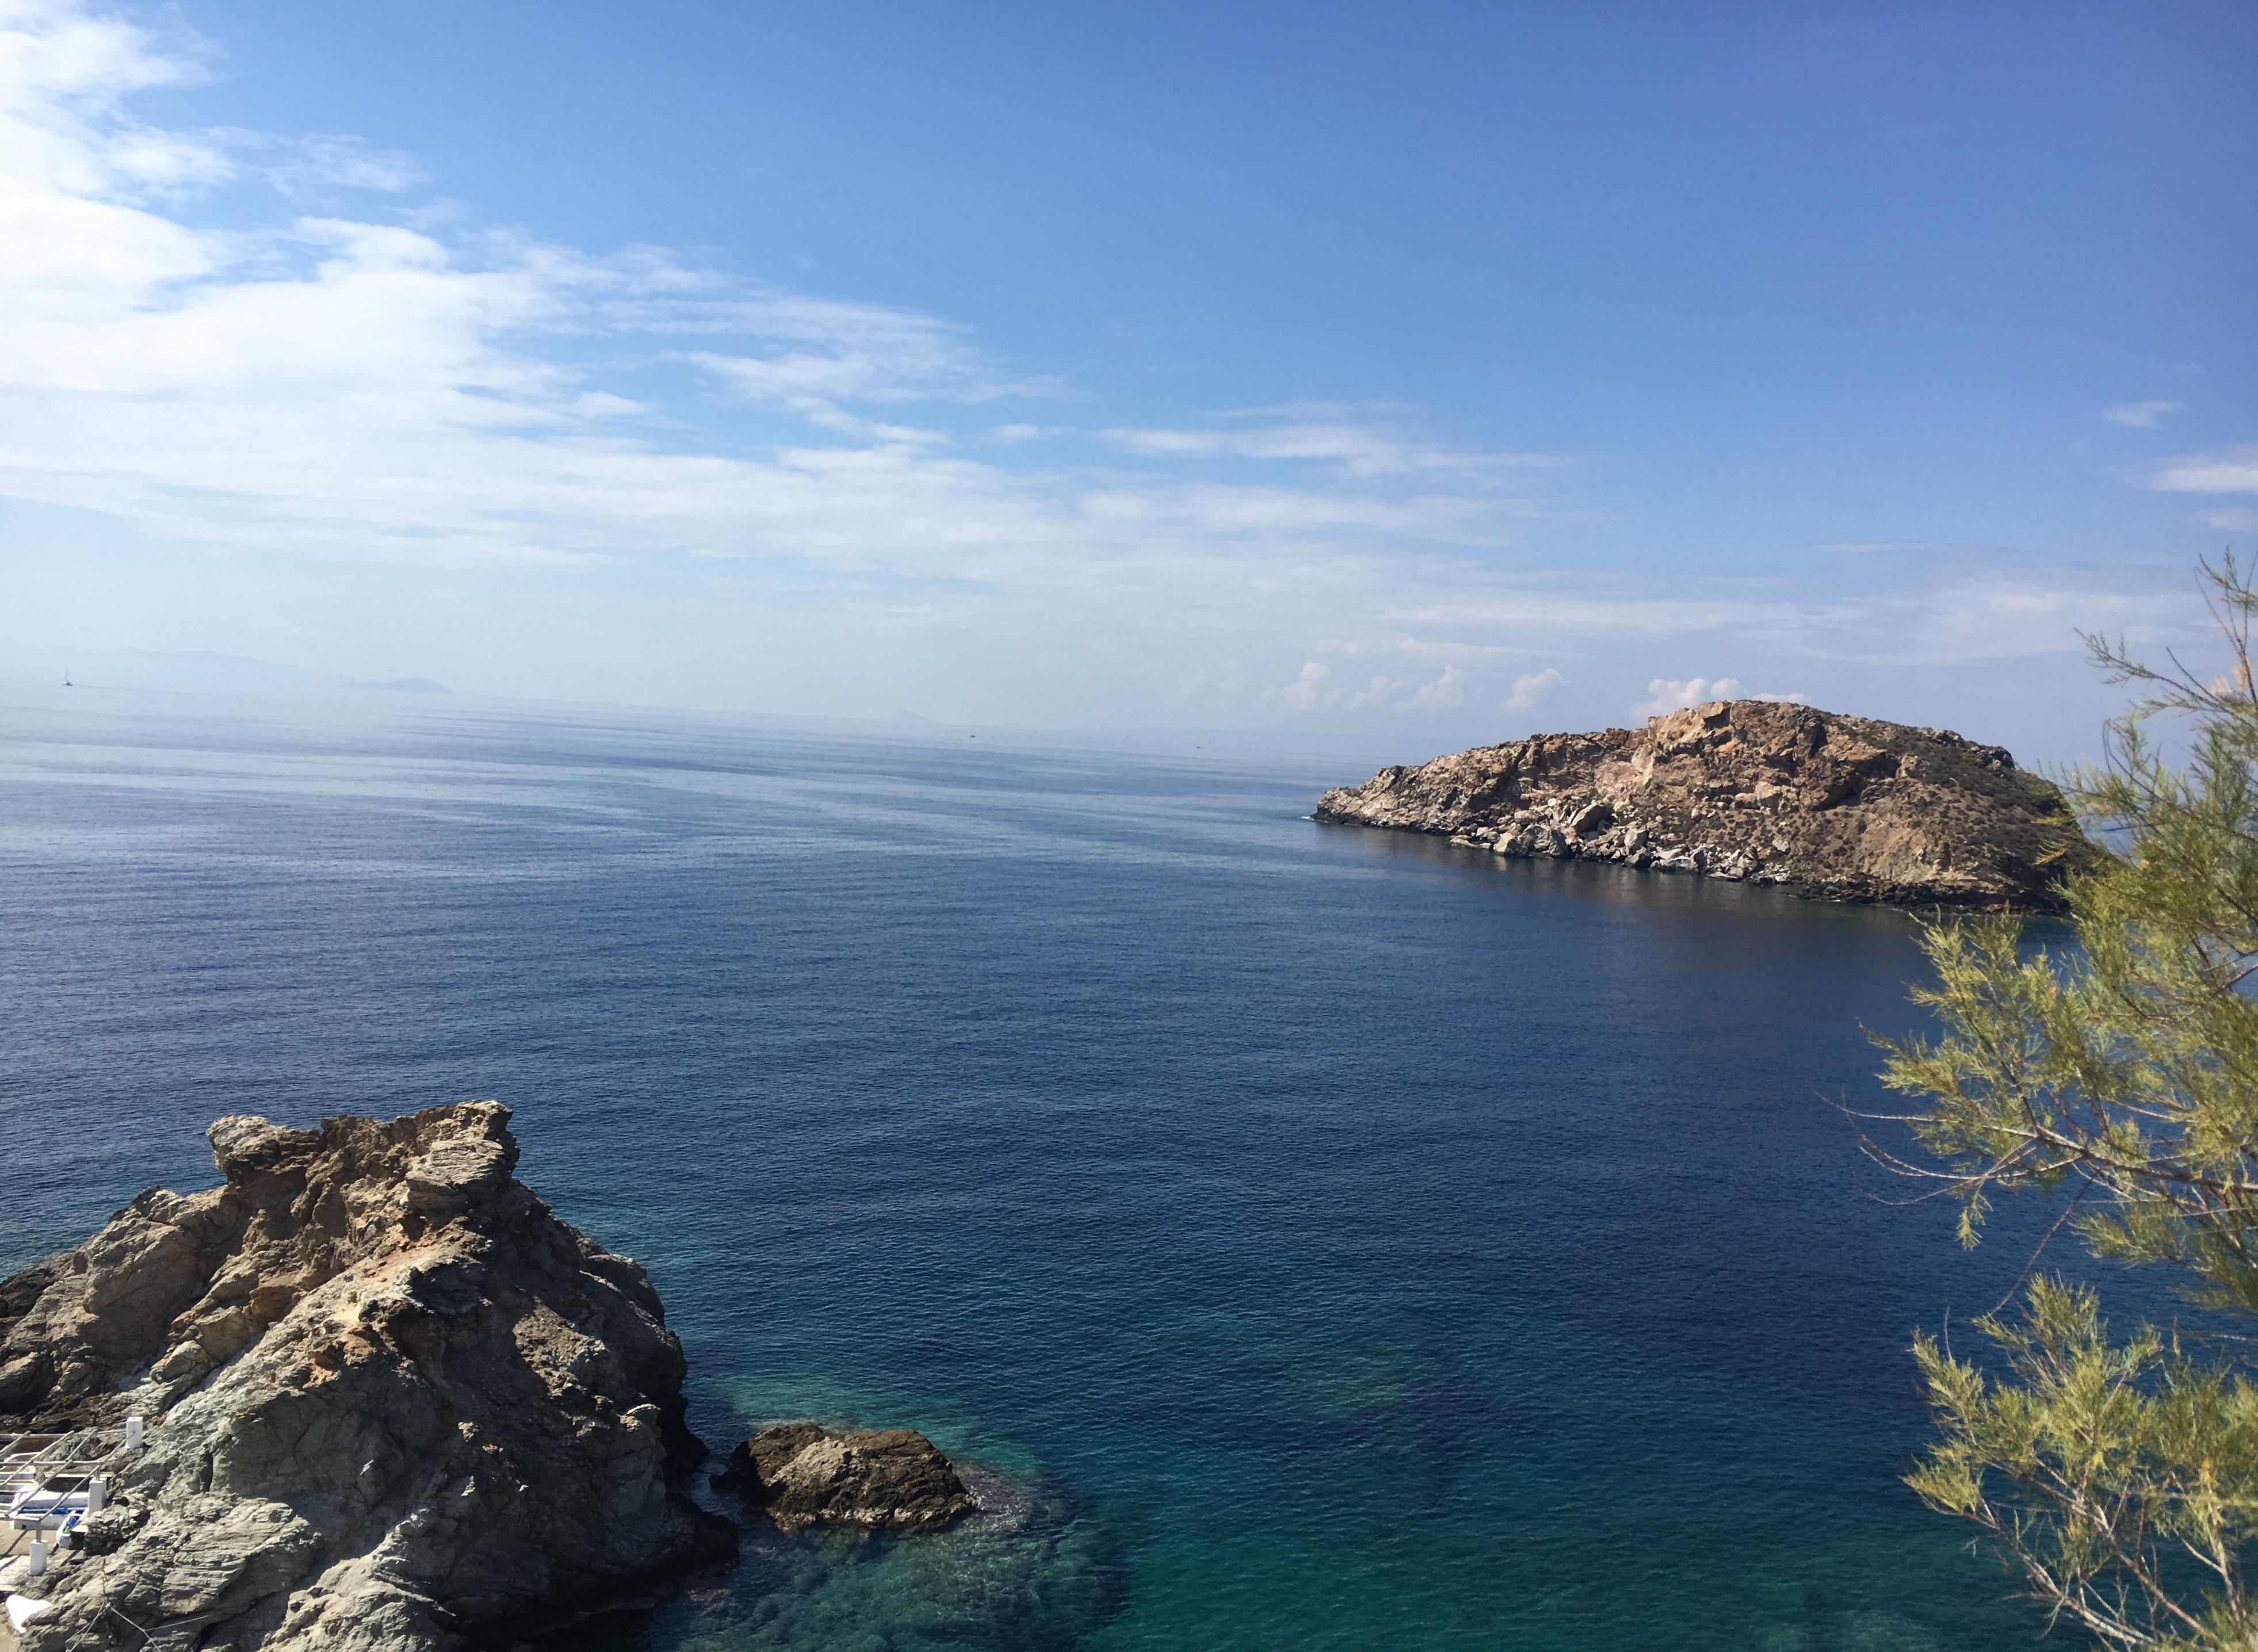 A beach near Poseidonia